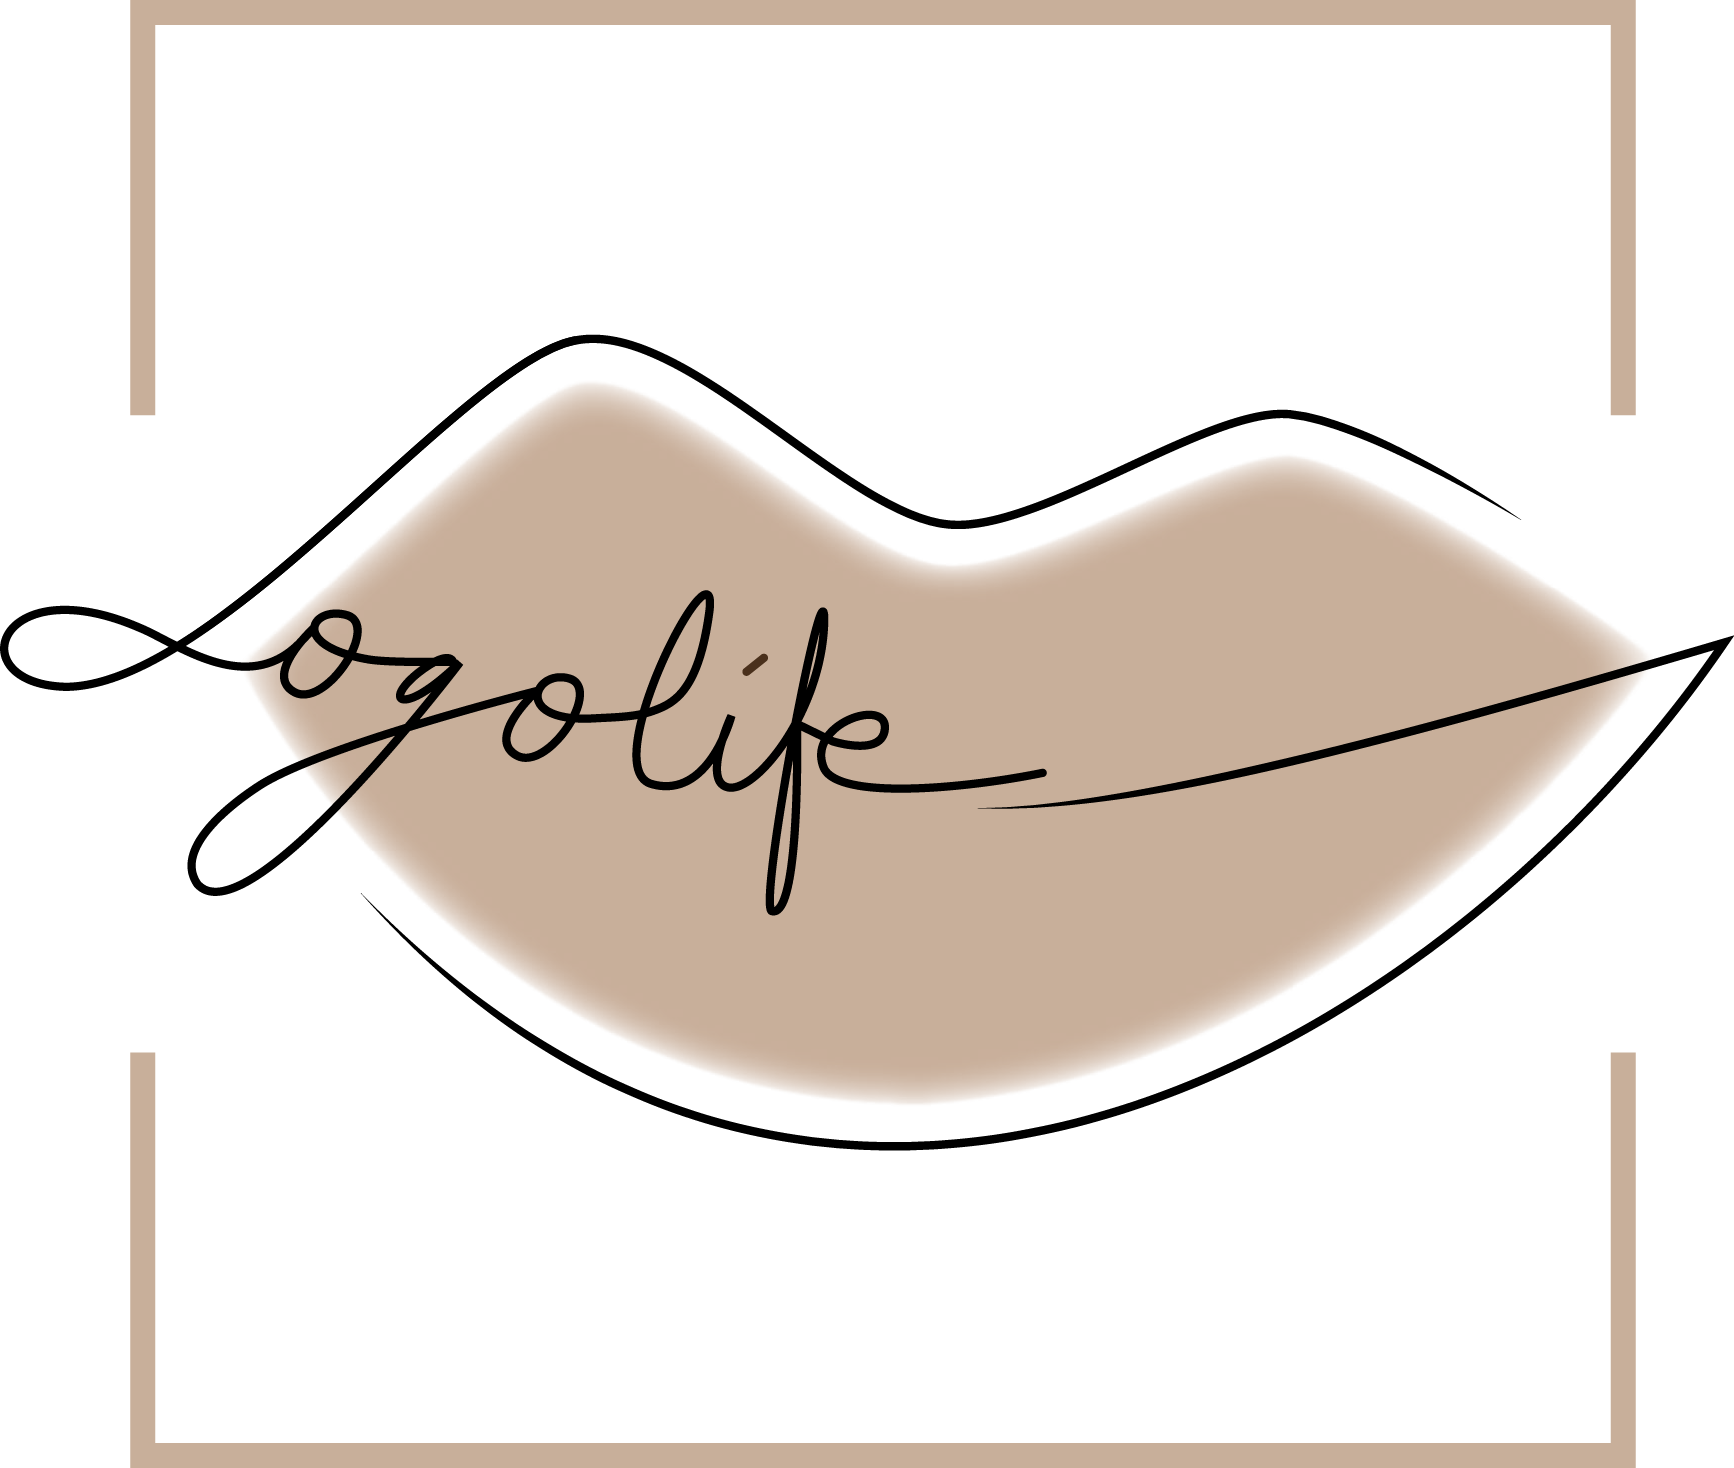 Logolife